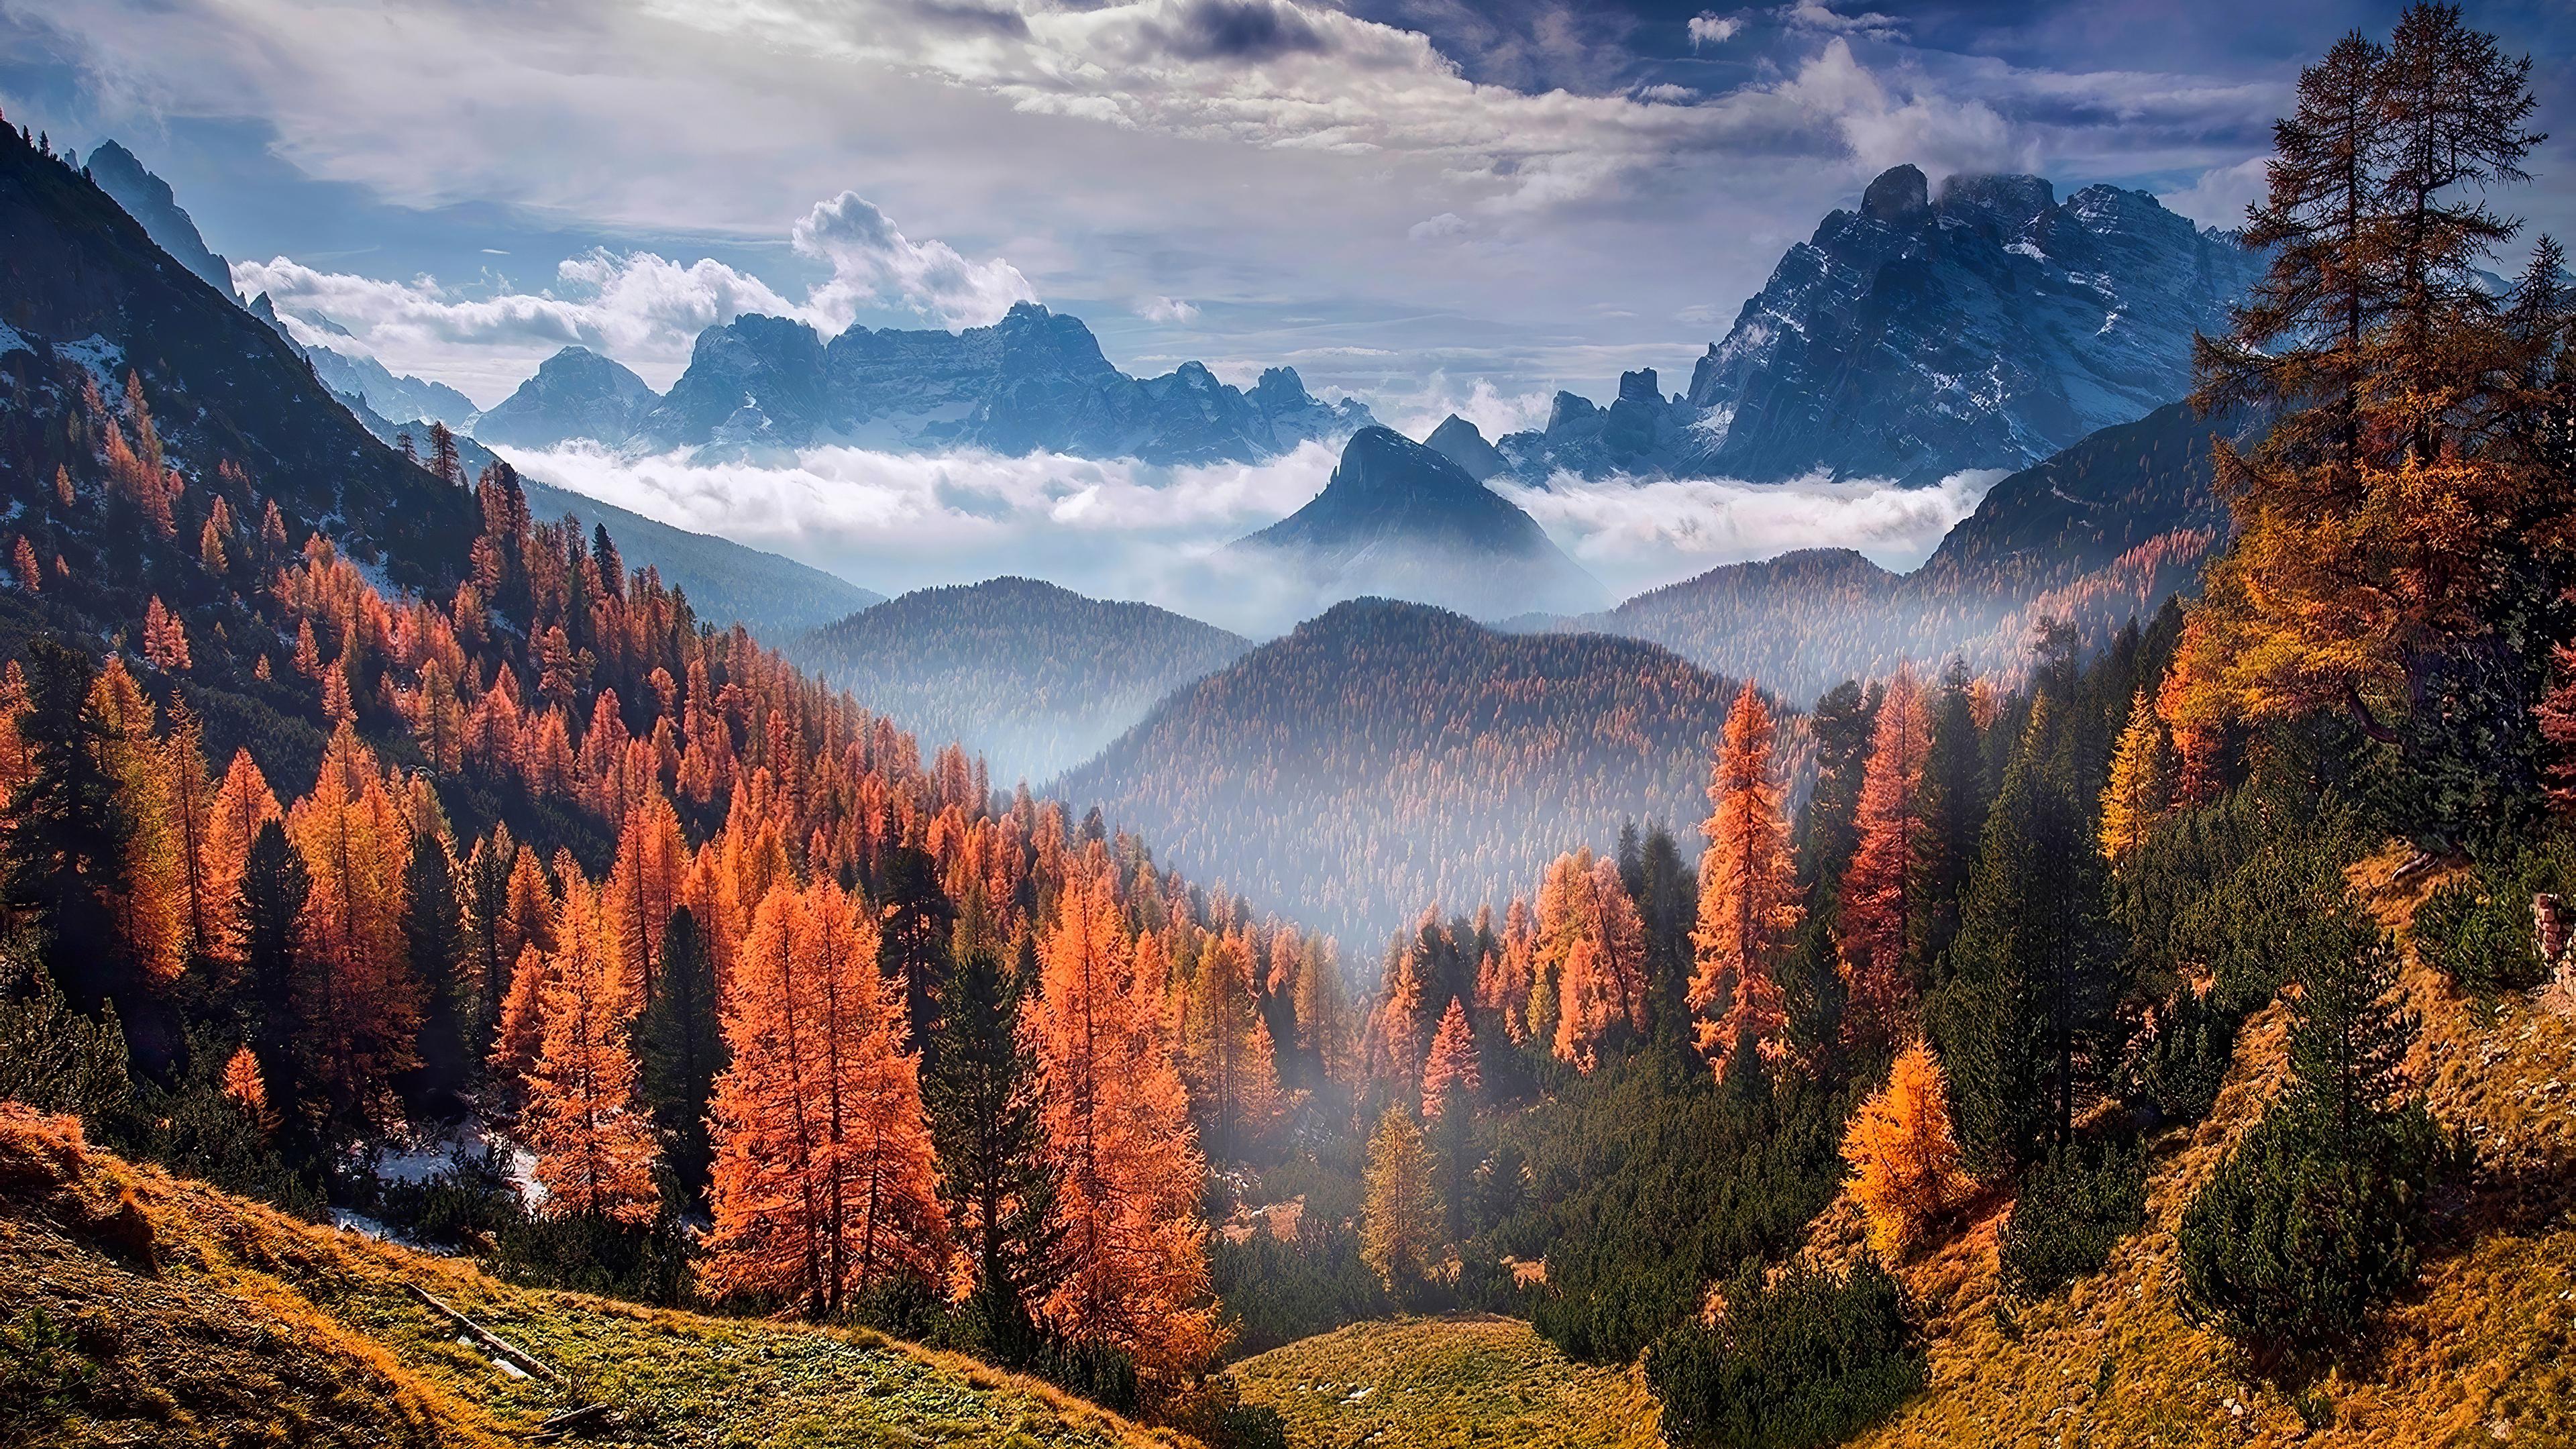 3840x2160 Forest Landscape Clouds 4k 4k HD 4k Wallpapers ...